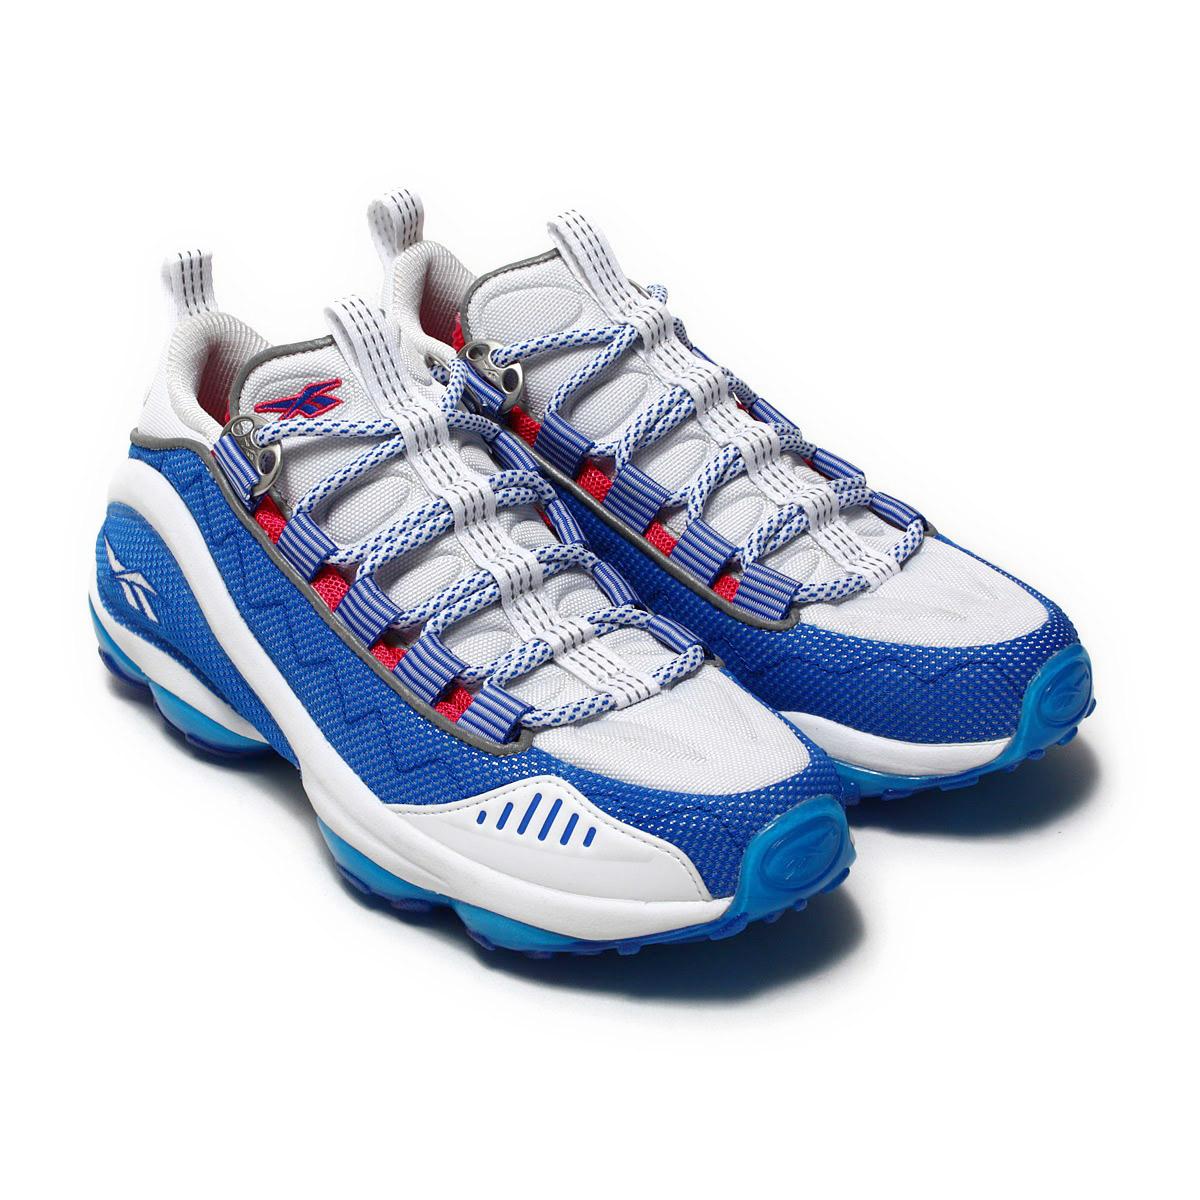 51f7c281399 Reebok CLASSIC (Reebok classical music) sneakers. DMX RUN 10 which appeared  in 1997